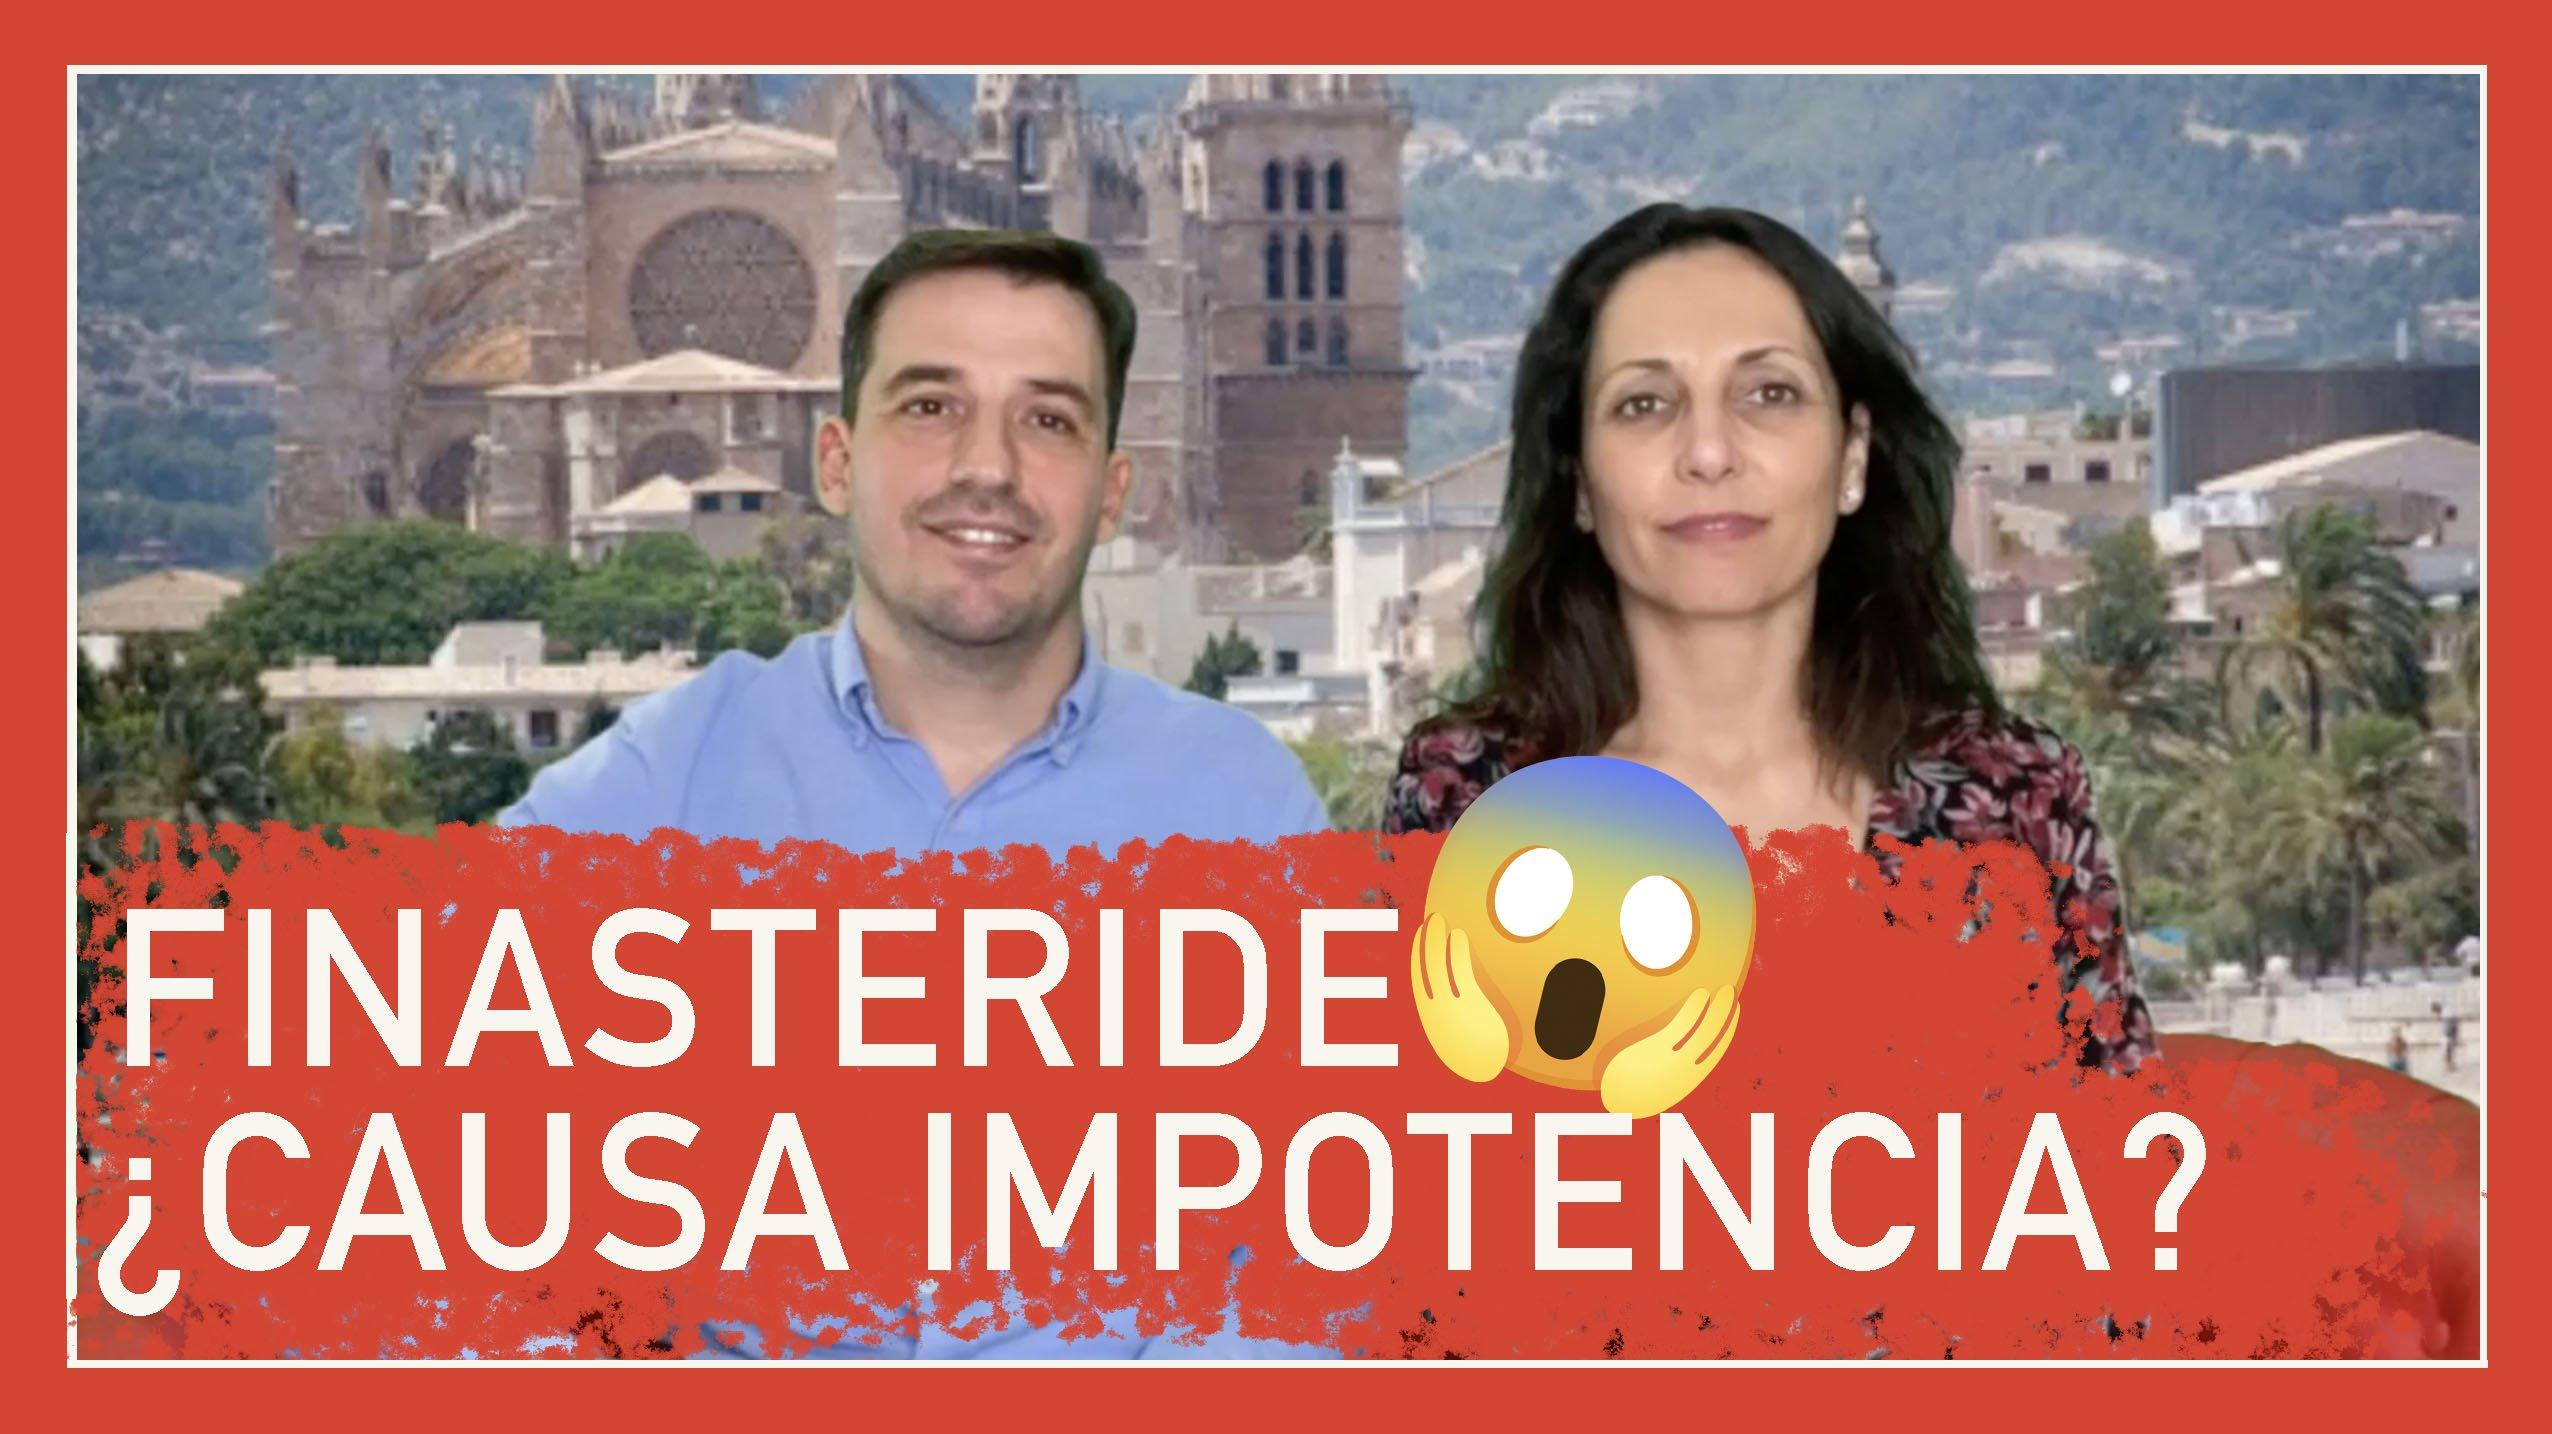 injerto-capilar-castellon-finasteride-dutasteride-efectos-secundarios-trasplante-implante-pelo